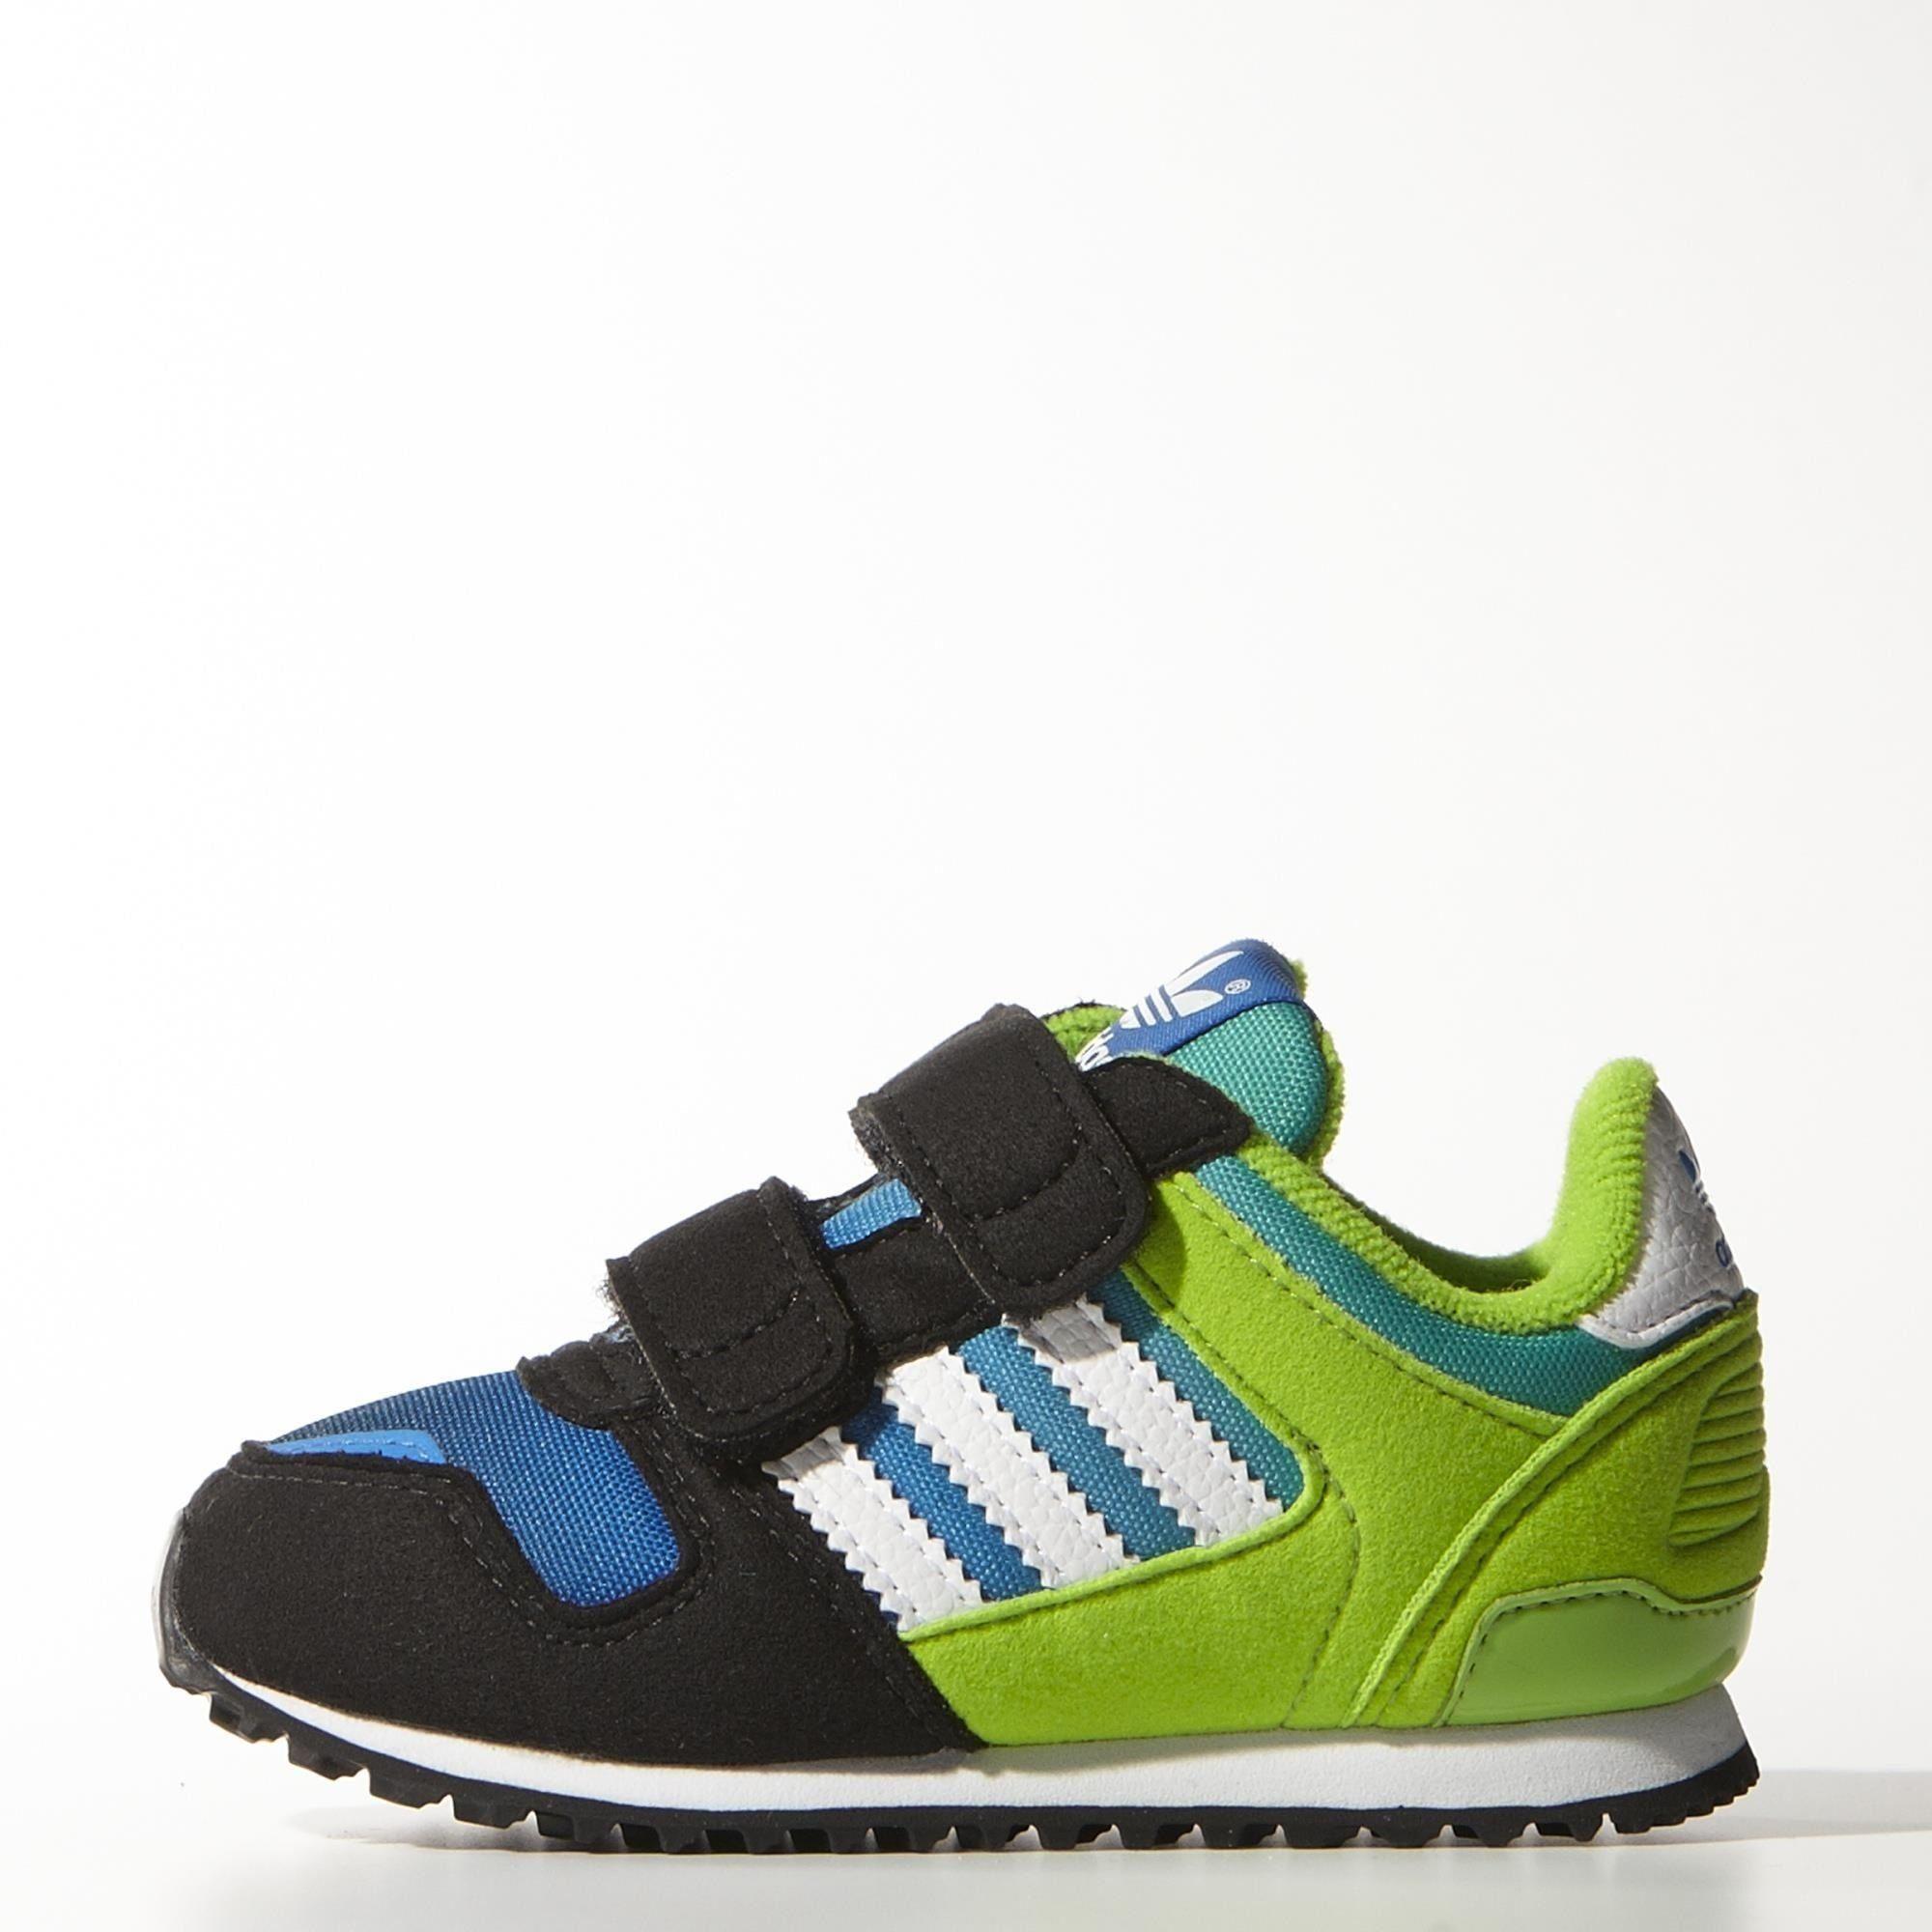 Adidas ZX 700 Bebé